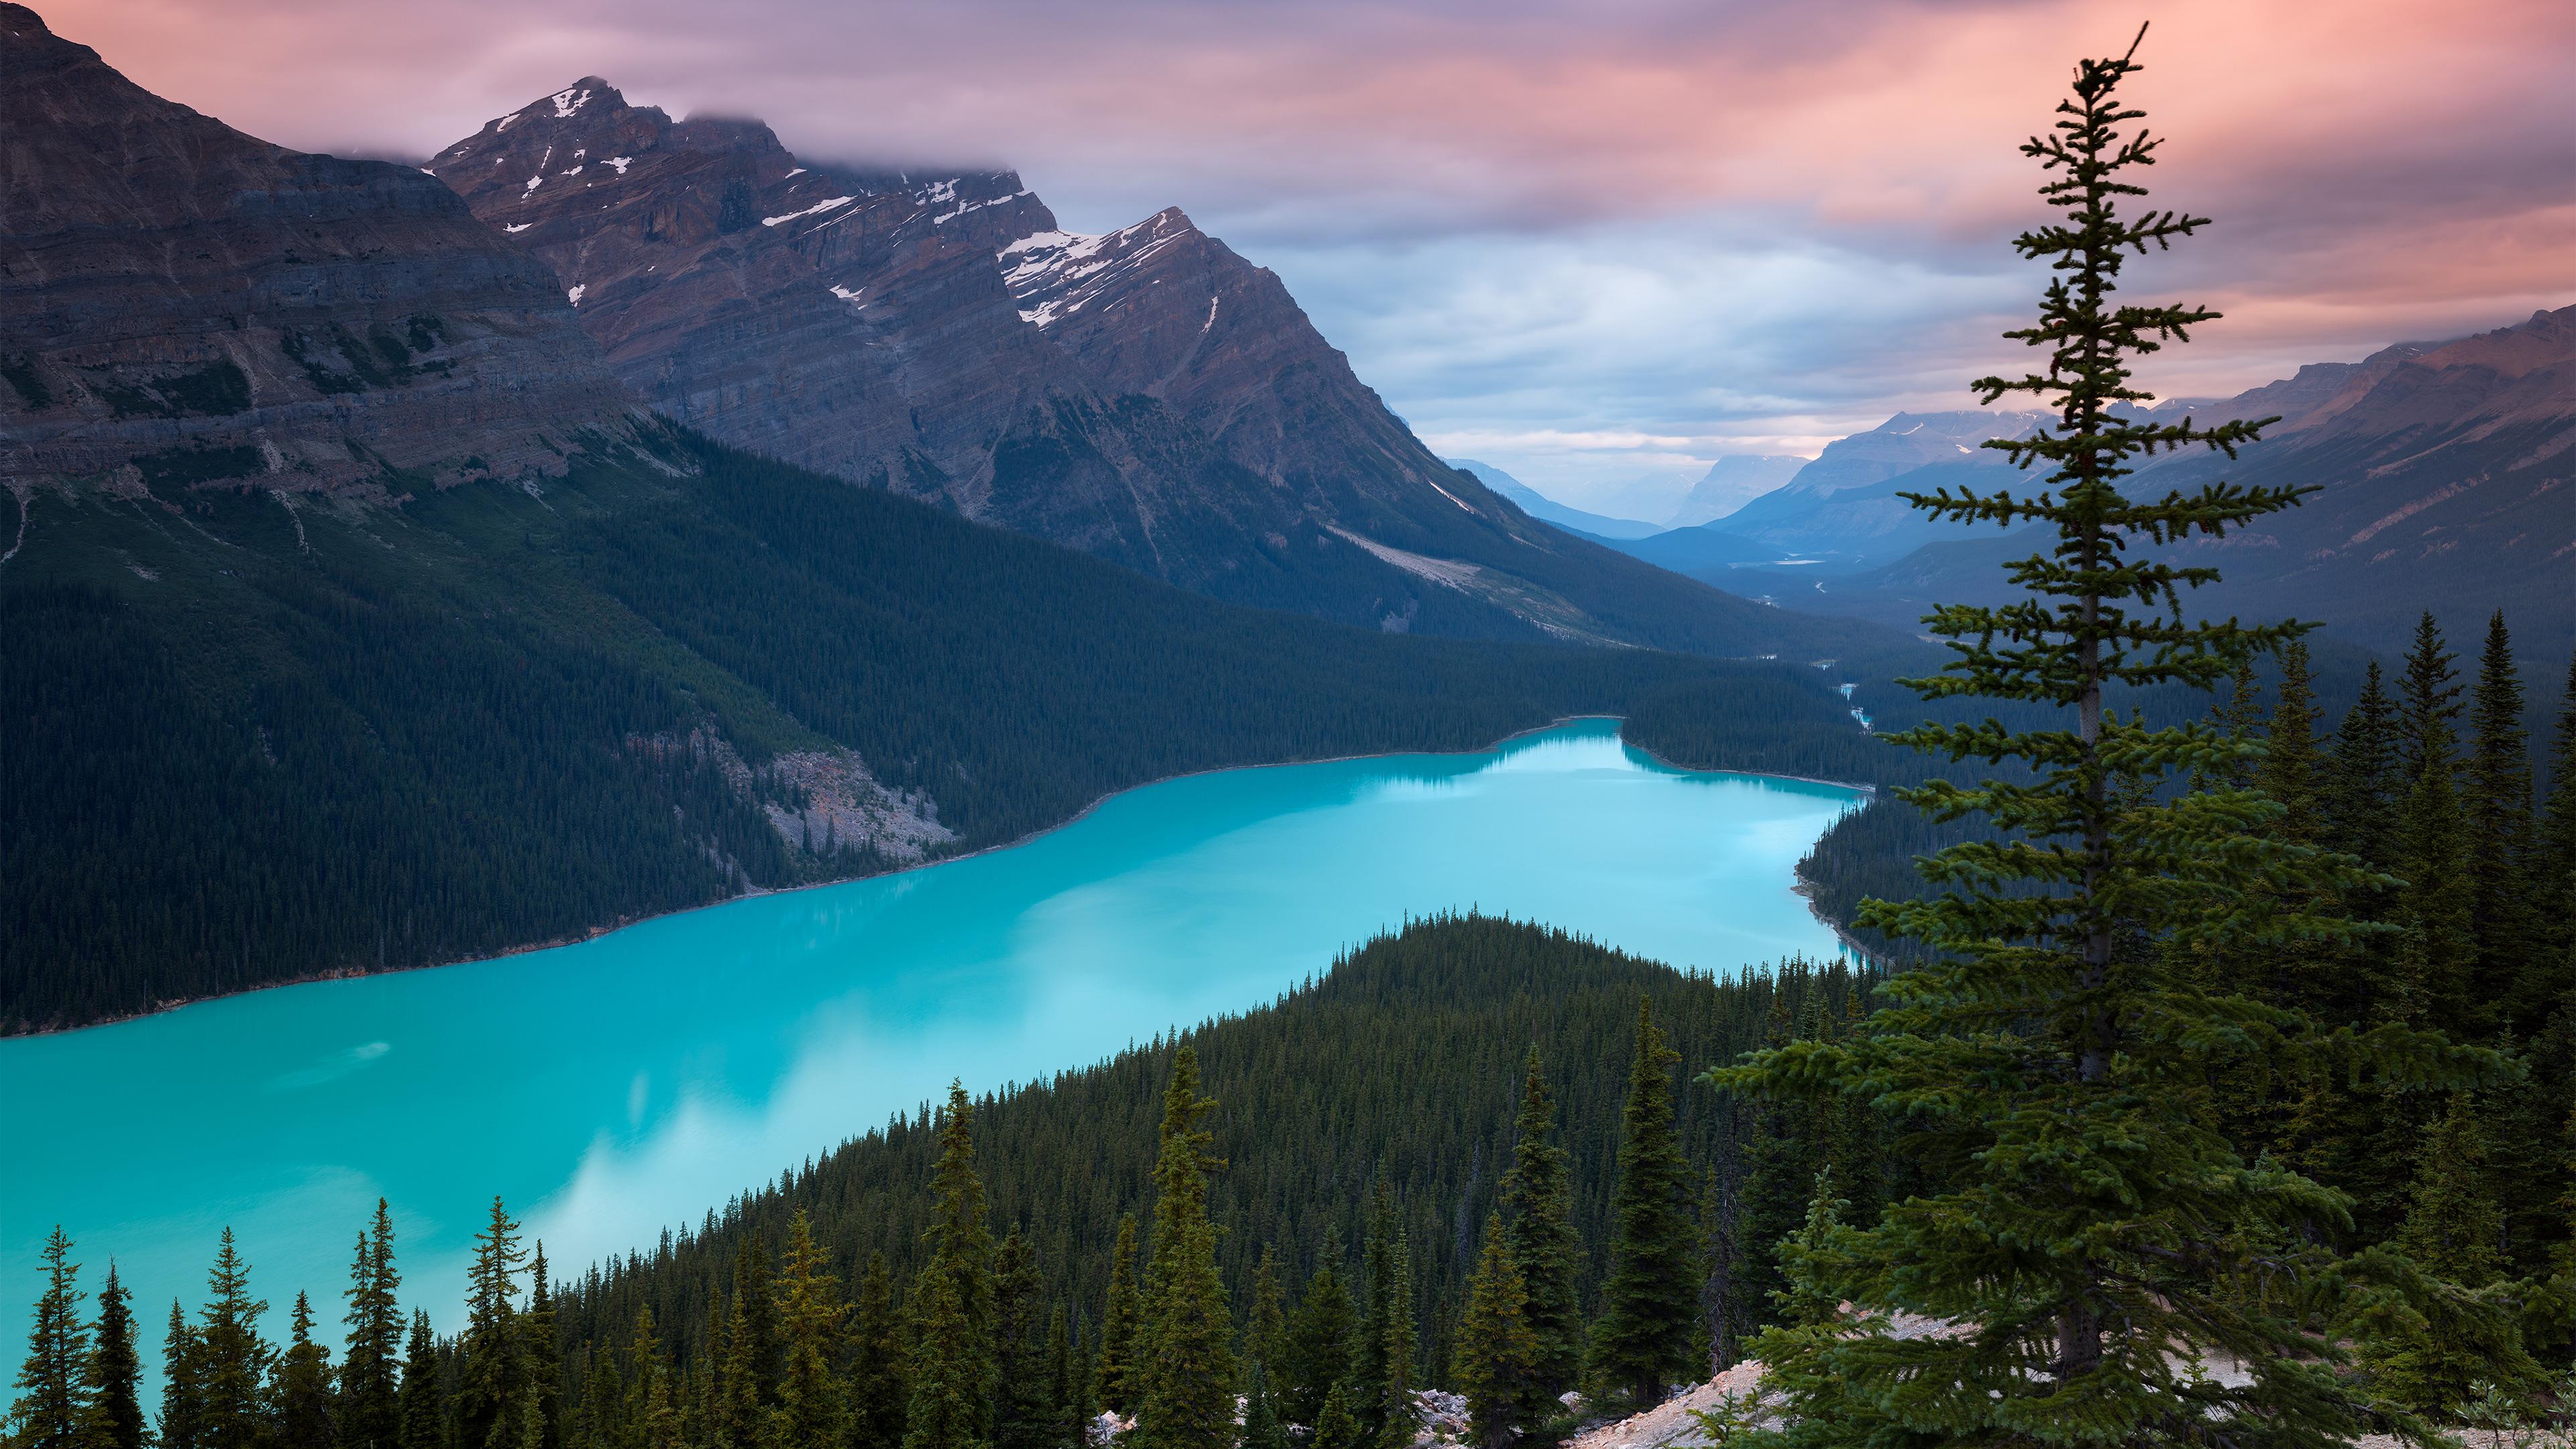 2560x1080 Peyto Lake Canada Mountains 4k 2560x1080 ...